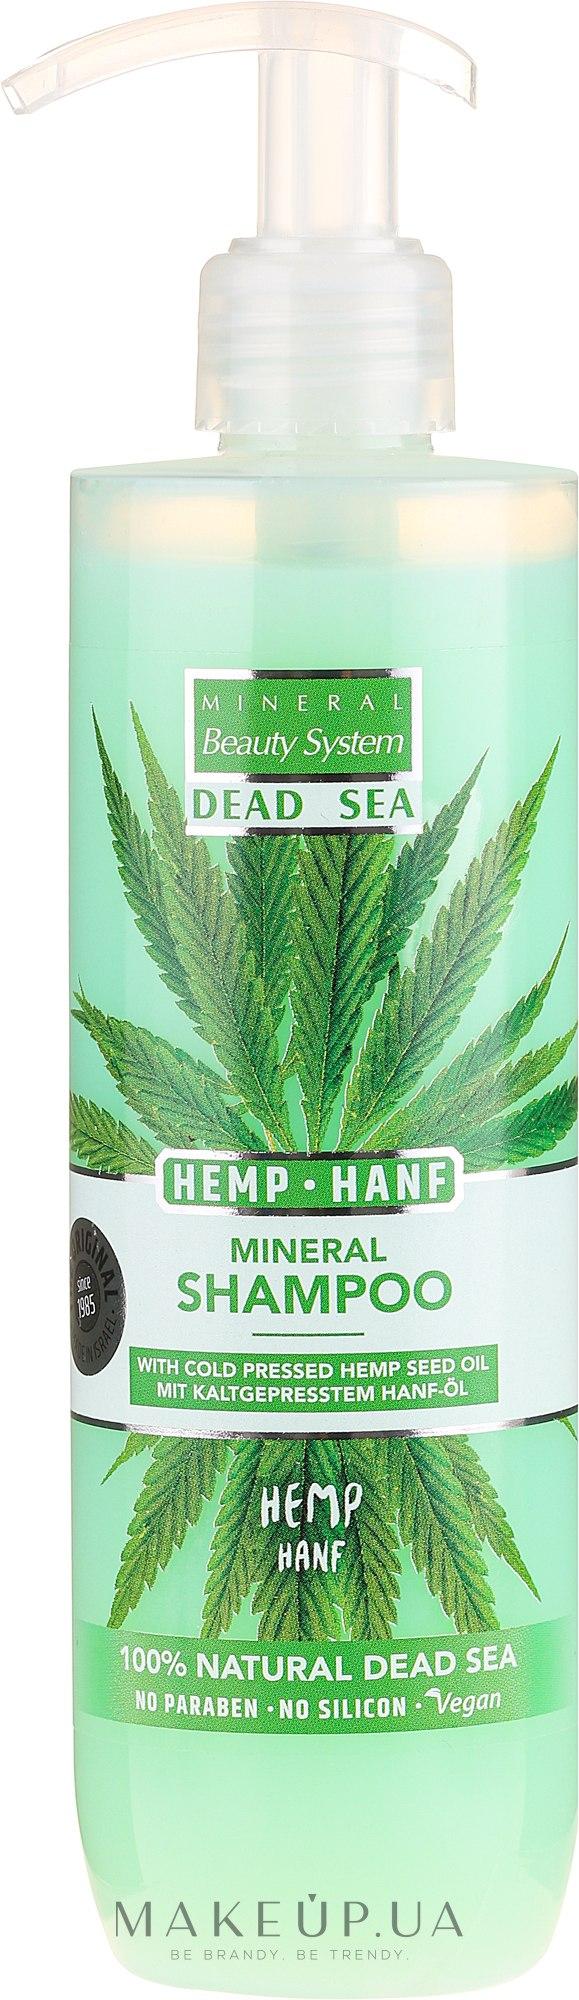 Конопляный шампунь с минералами Мёртвого моря - Mineral Beauty System Dead Sea Minerals & Cold Pressed Hemp Oil Shampoo — фото 300ml